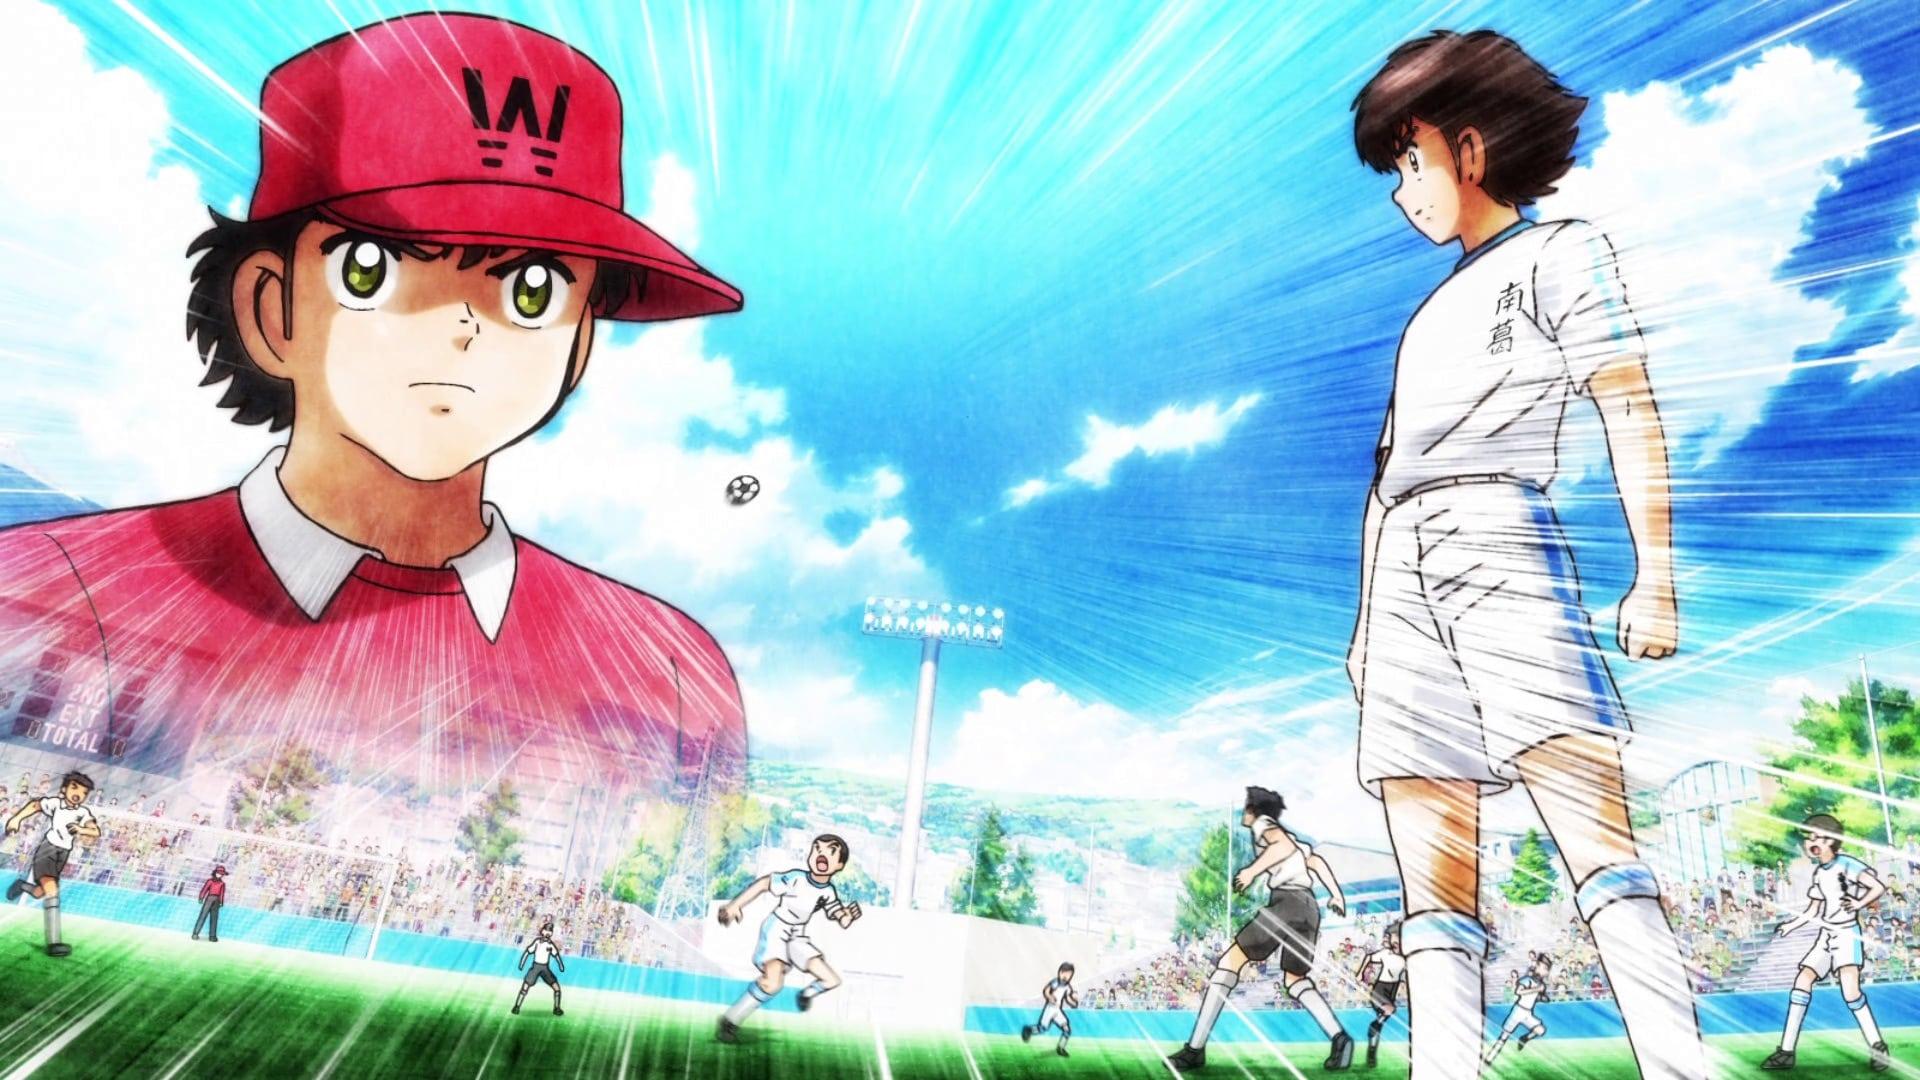 Captain Tsubasa Kick Off Nankatsu Vs Shuutetsu 2018 Backdrops